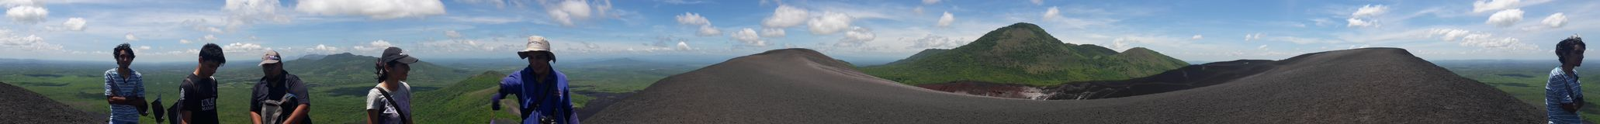 Cerro neger- landskap Royaltyfria Foton